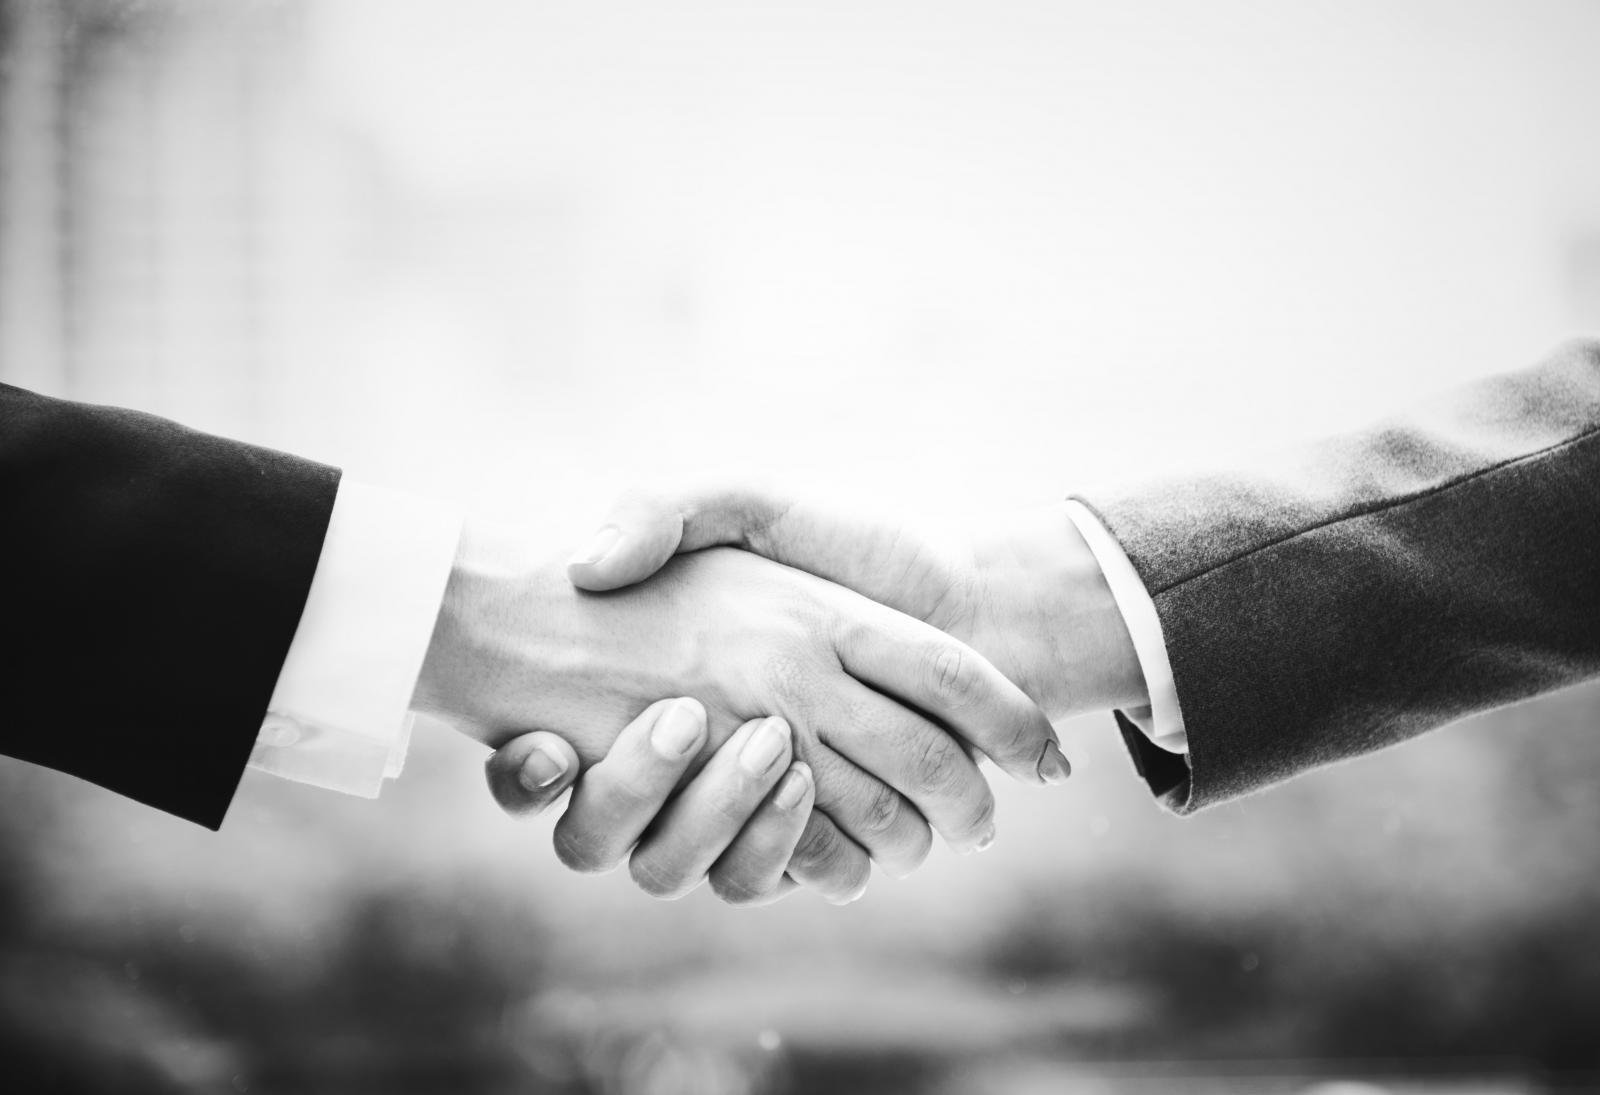 Handshake. Photo credit: Pexels